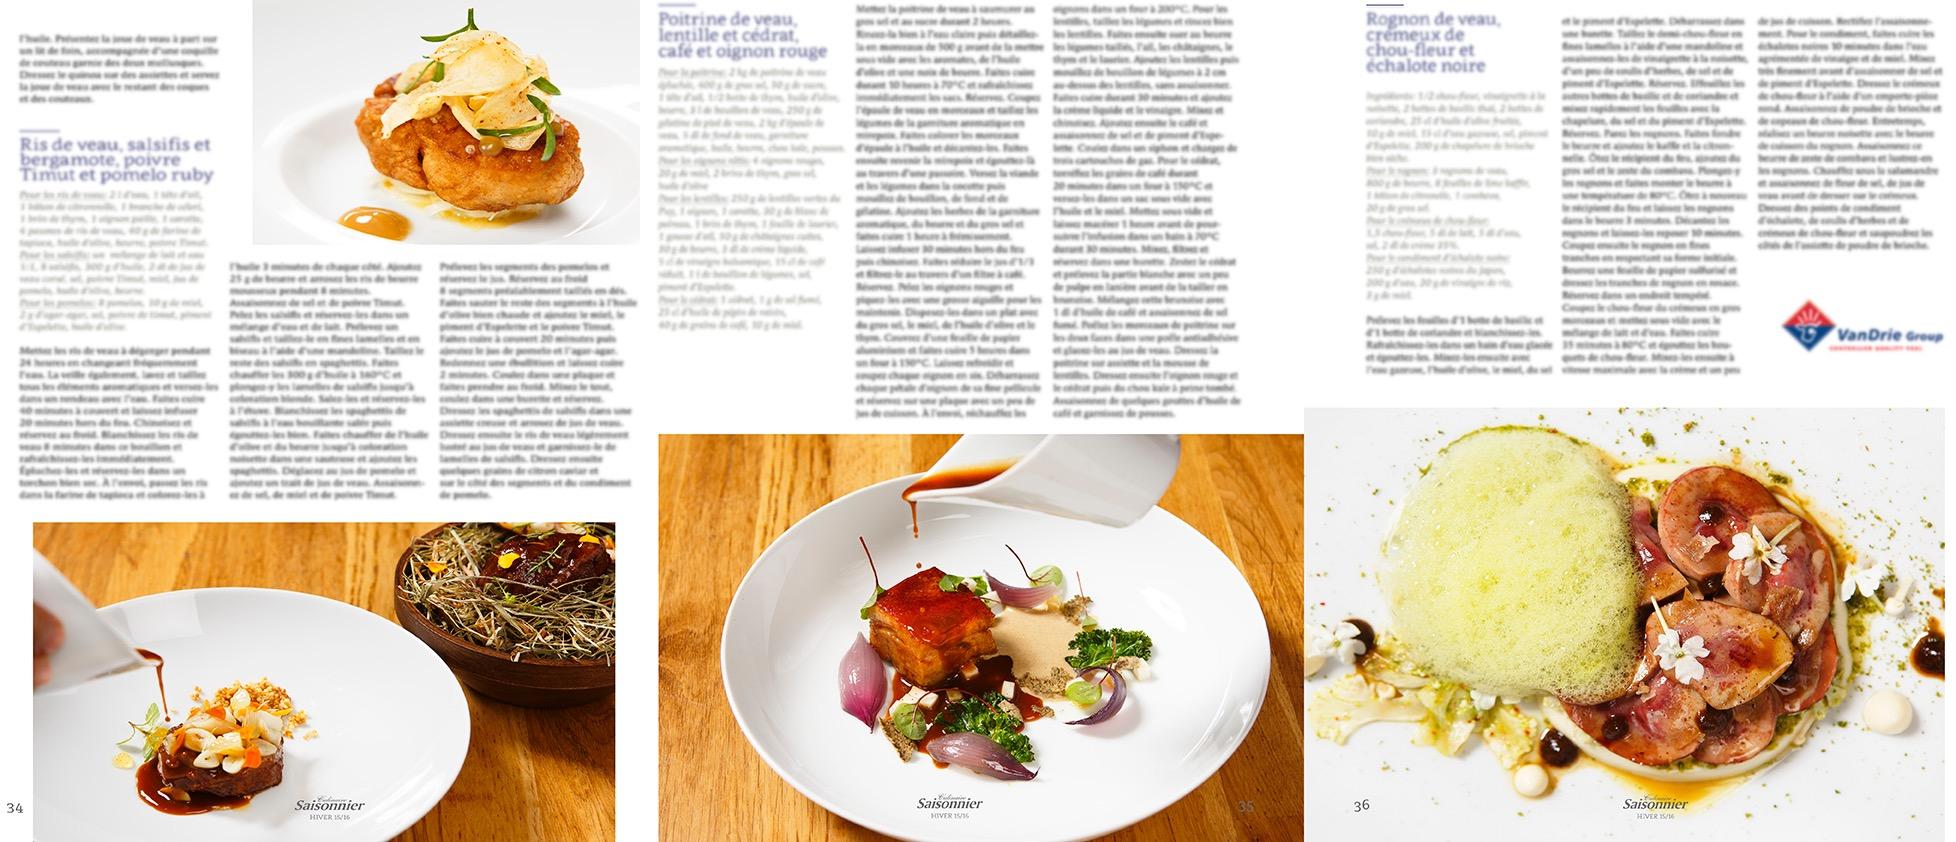 culinaire-saisonnier-n56-reportage-santiago-torrijos-2